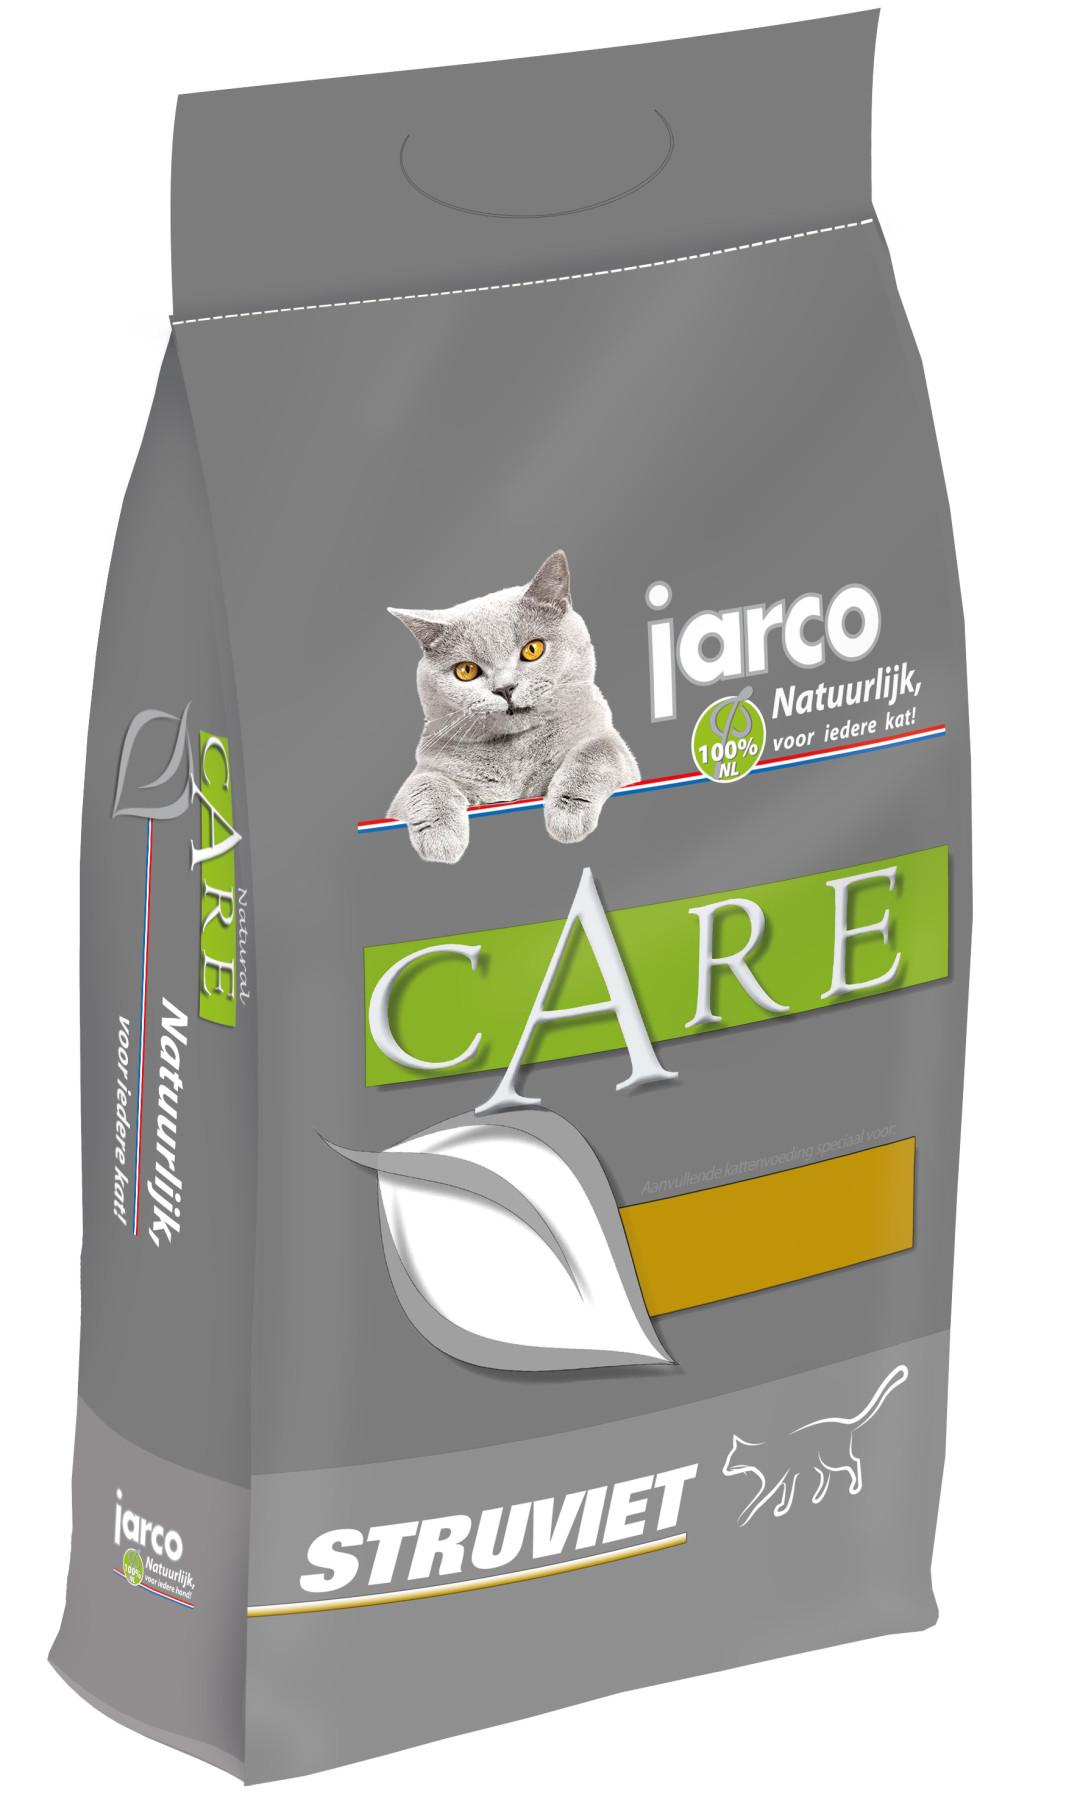 Jarco kattenvoer Natural Anti-Struviet Gevogelte 6 kg